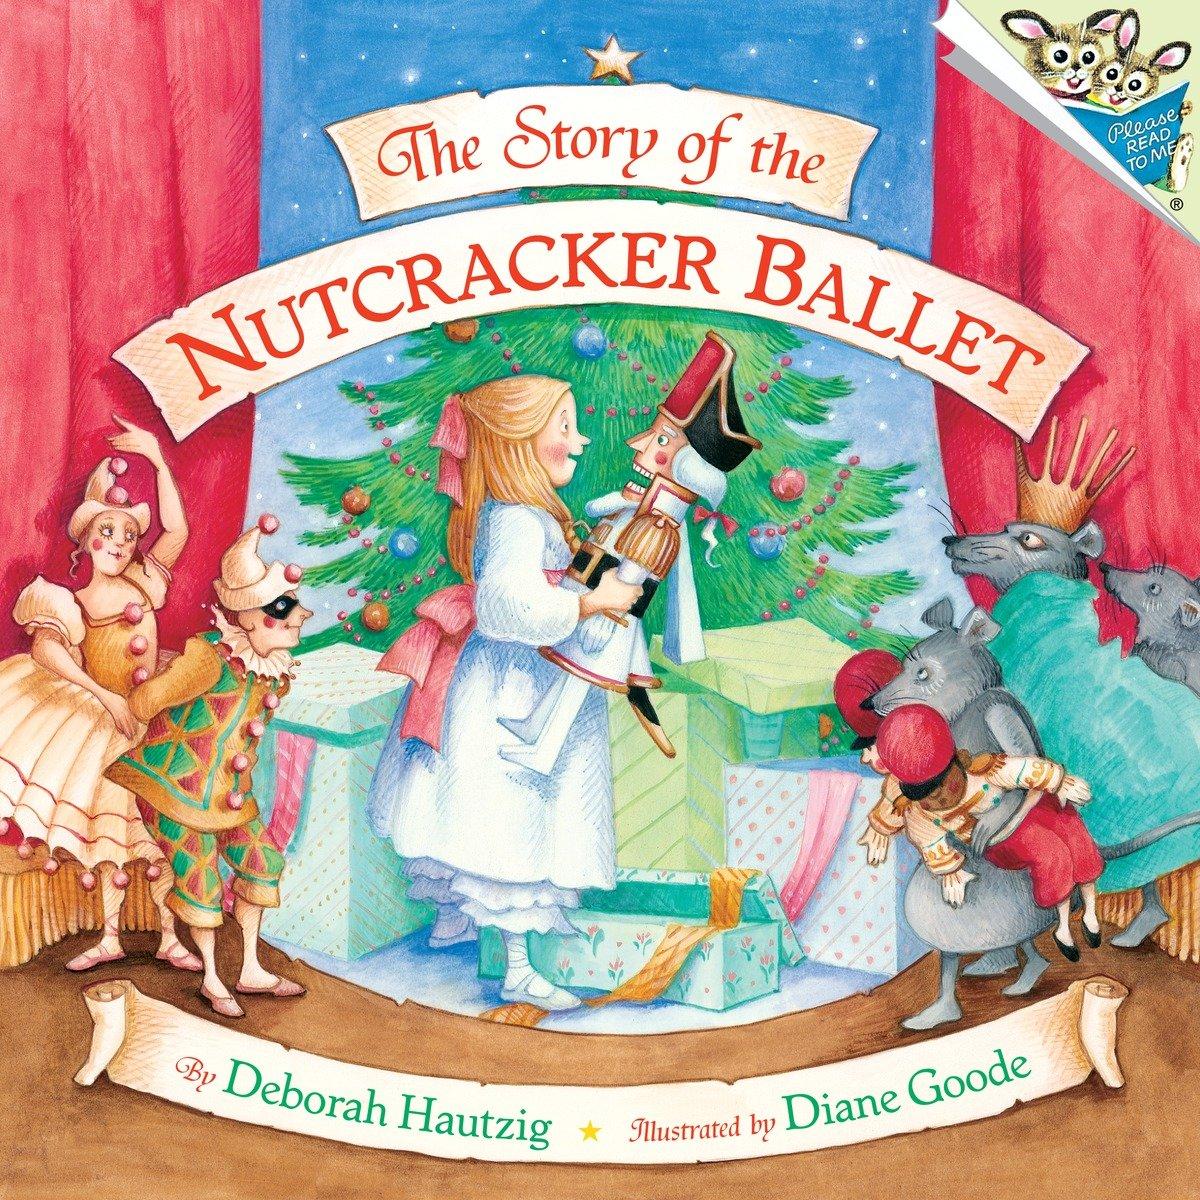 Uncategorized Christmas Stories Read Online the story of nutcracker ballet picturebackr deborah hautzig diane goode 9780394881782 amazon com books